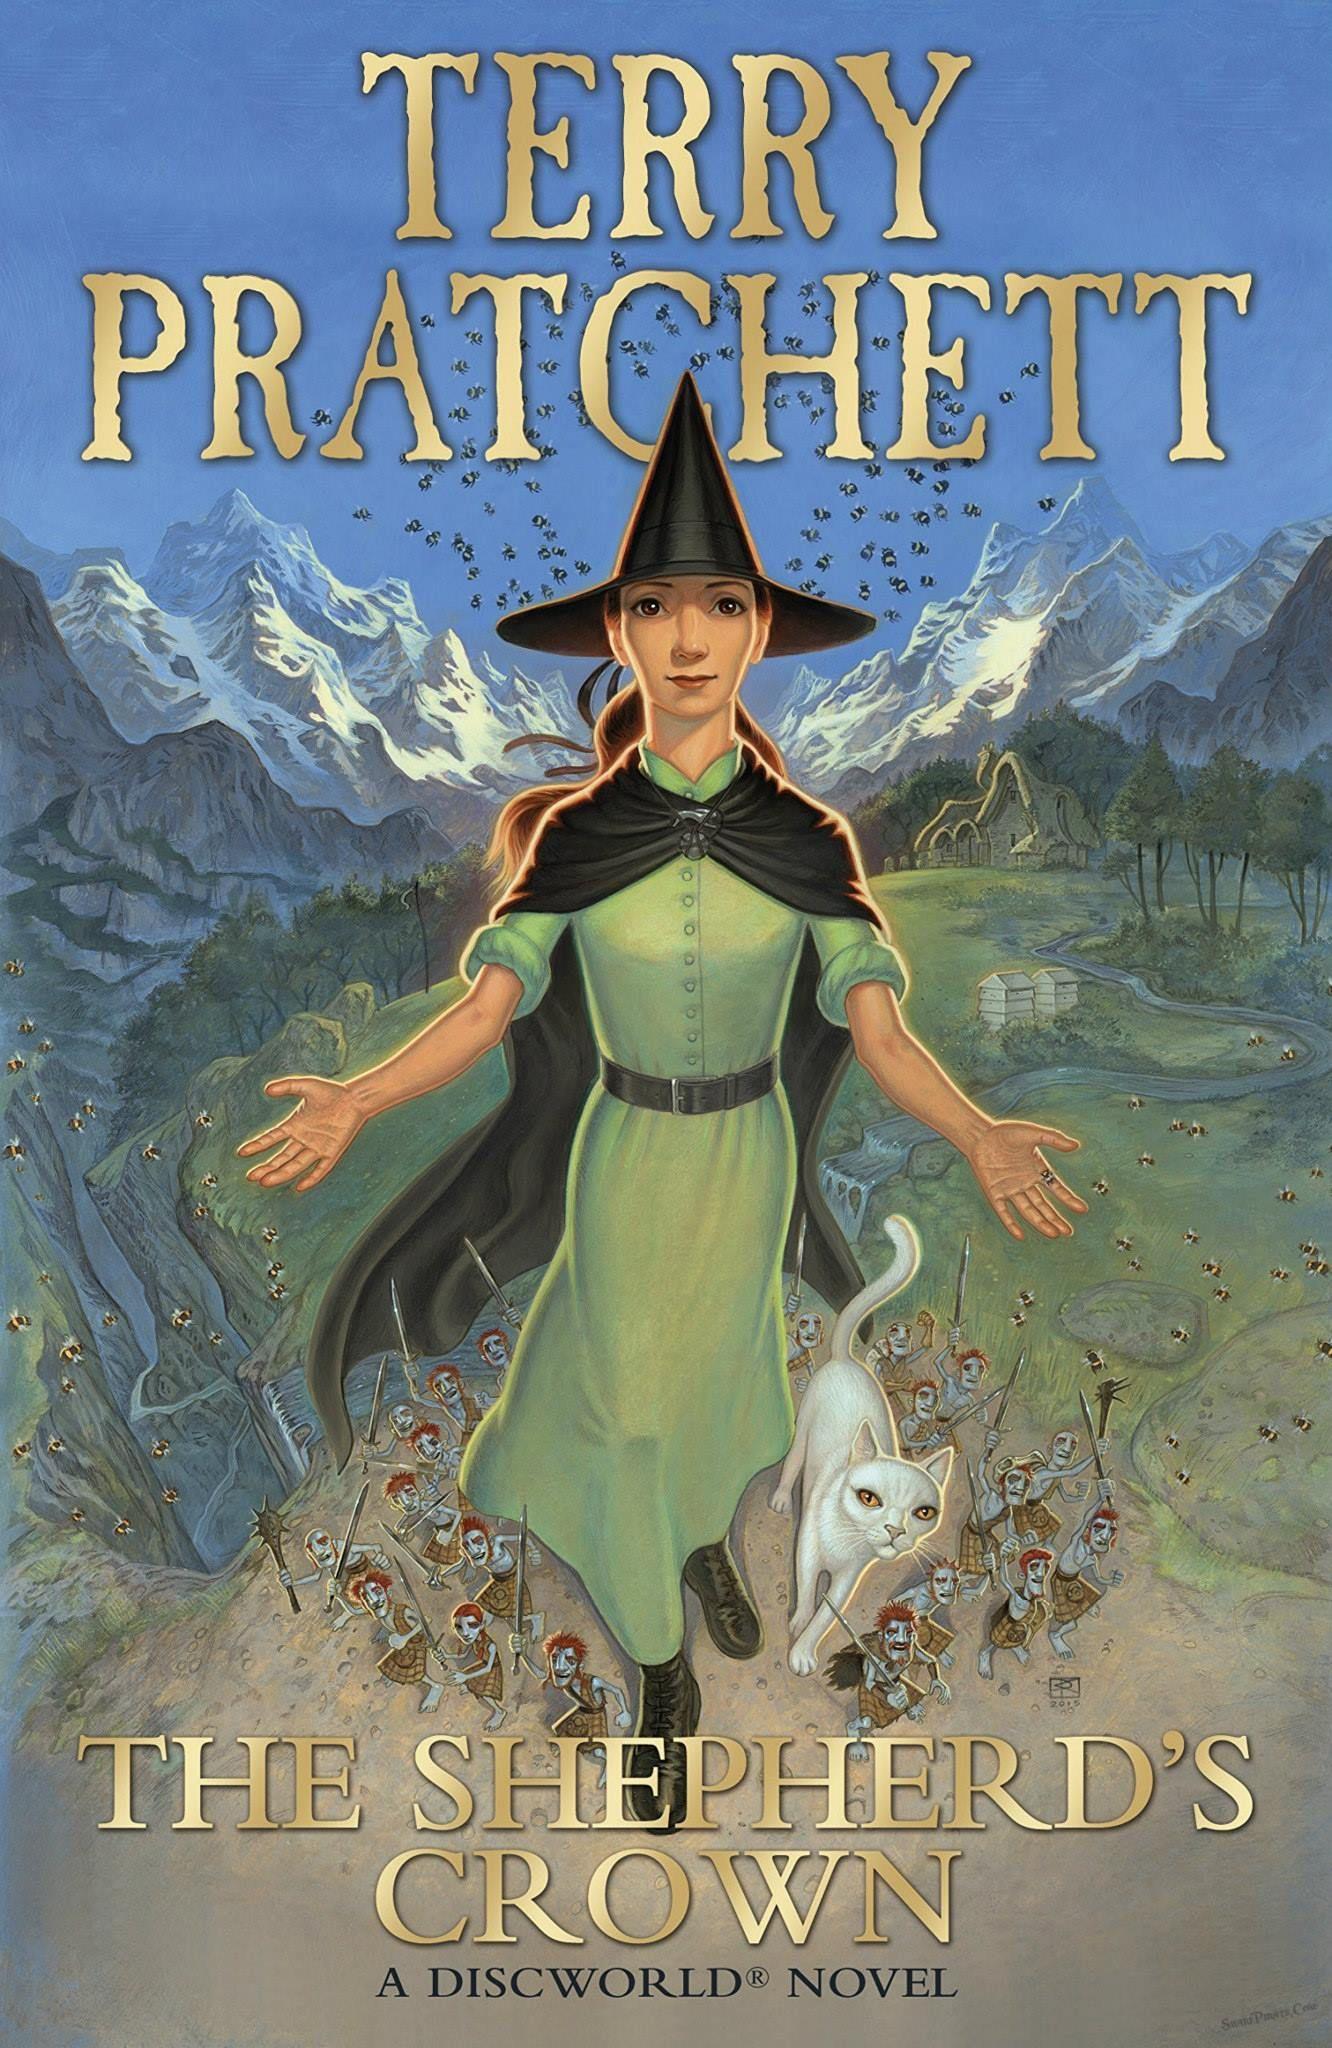 Terry Pratchett The Shepherd's Crown Epub Pdf  Sharepirate